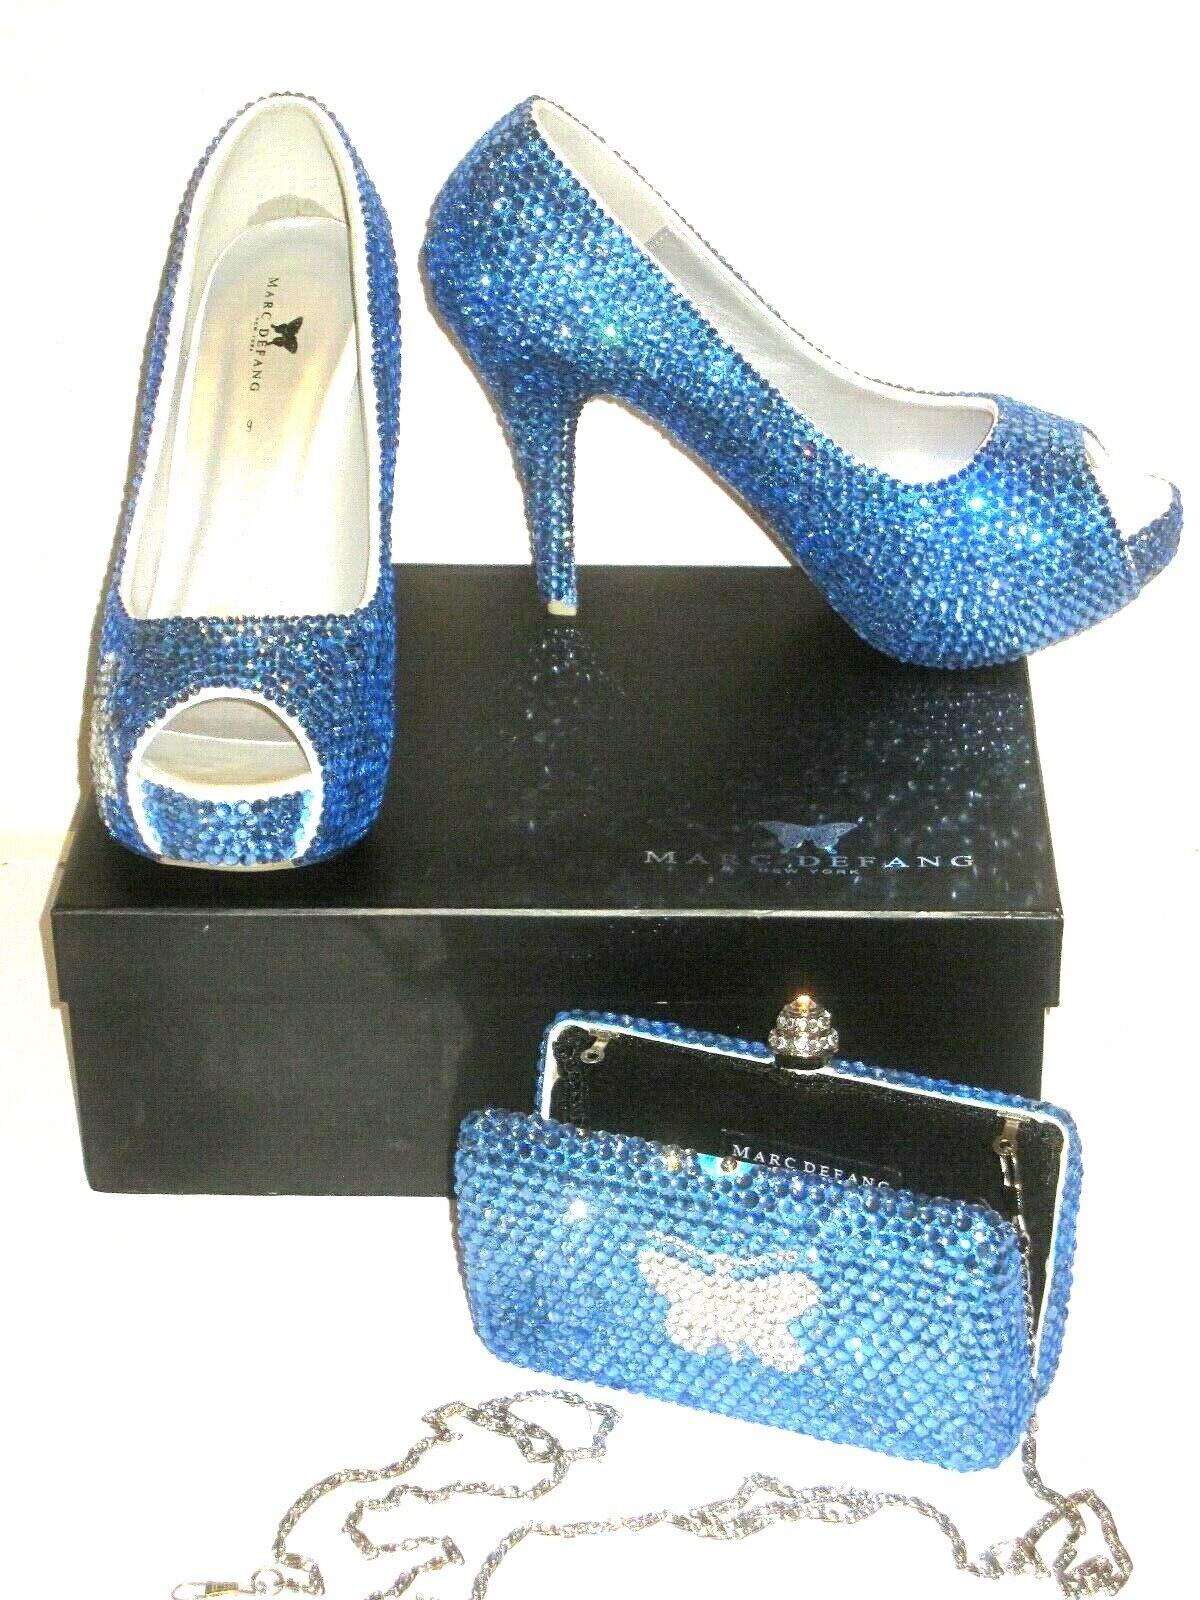 Marc Defang High Heels bluee Crystal Purse Set Size 9